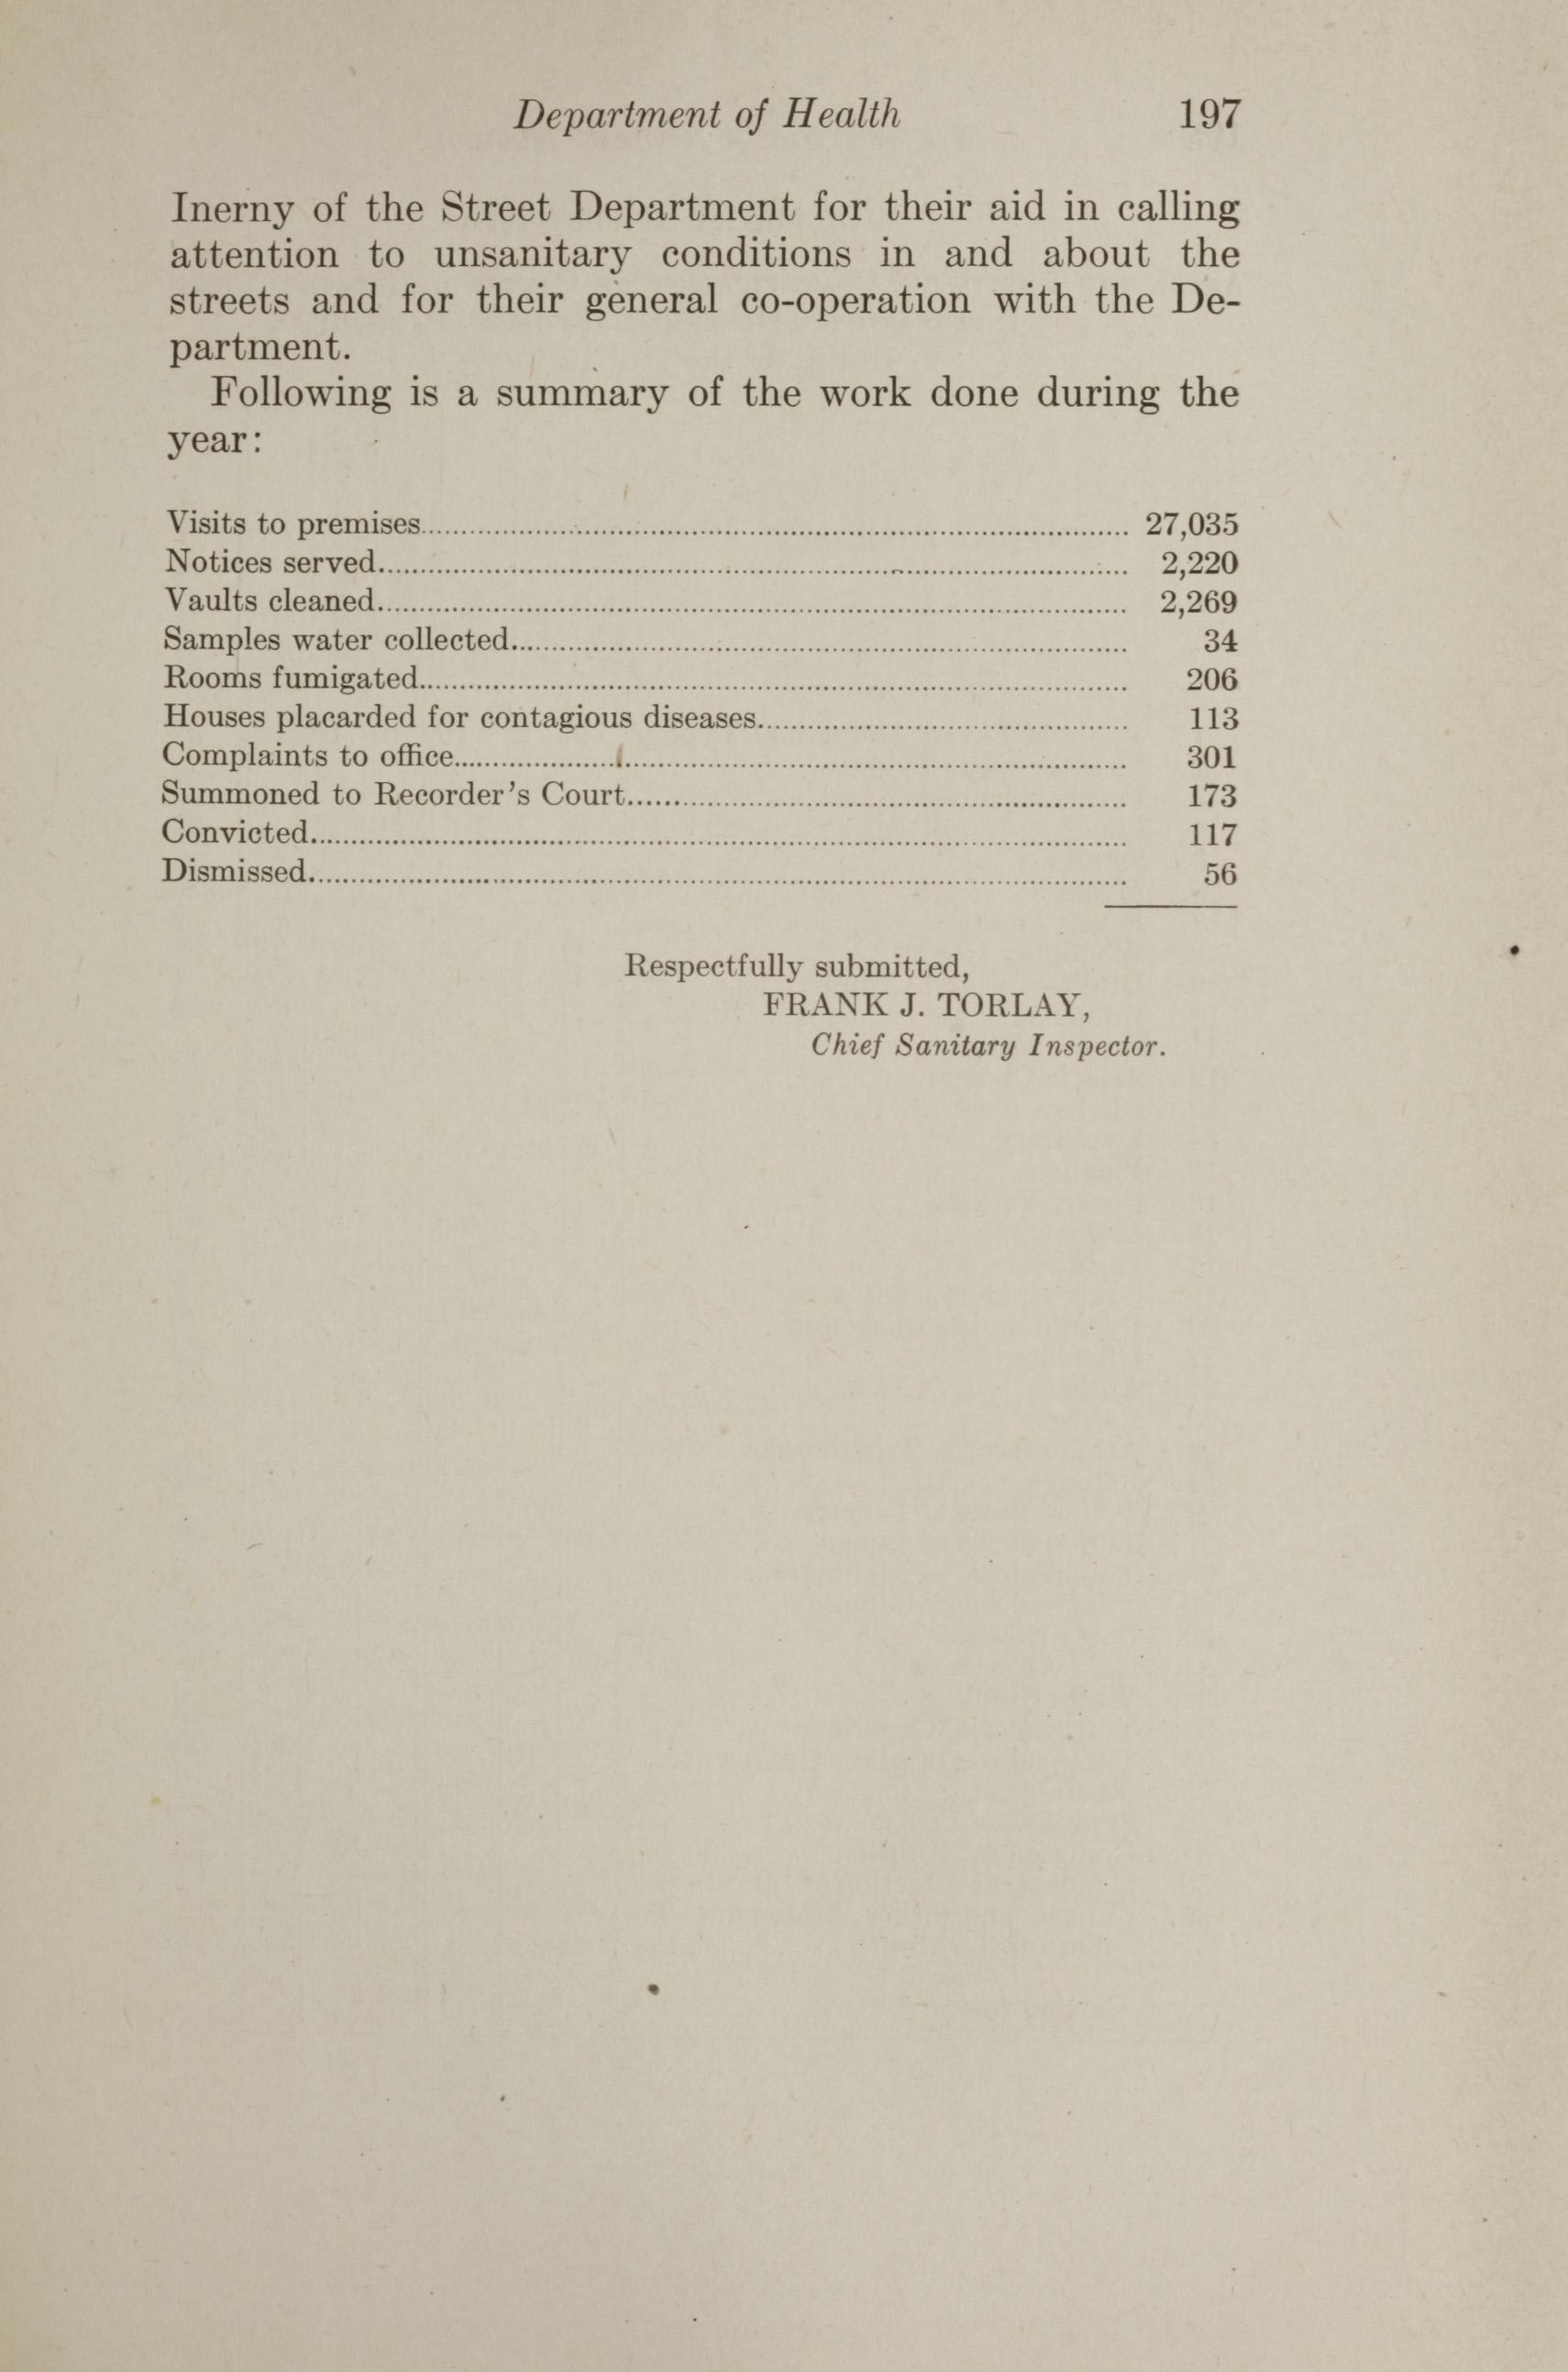 Charleston Yearbook, 1912, page 197